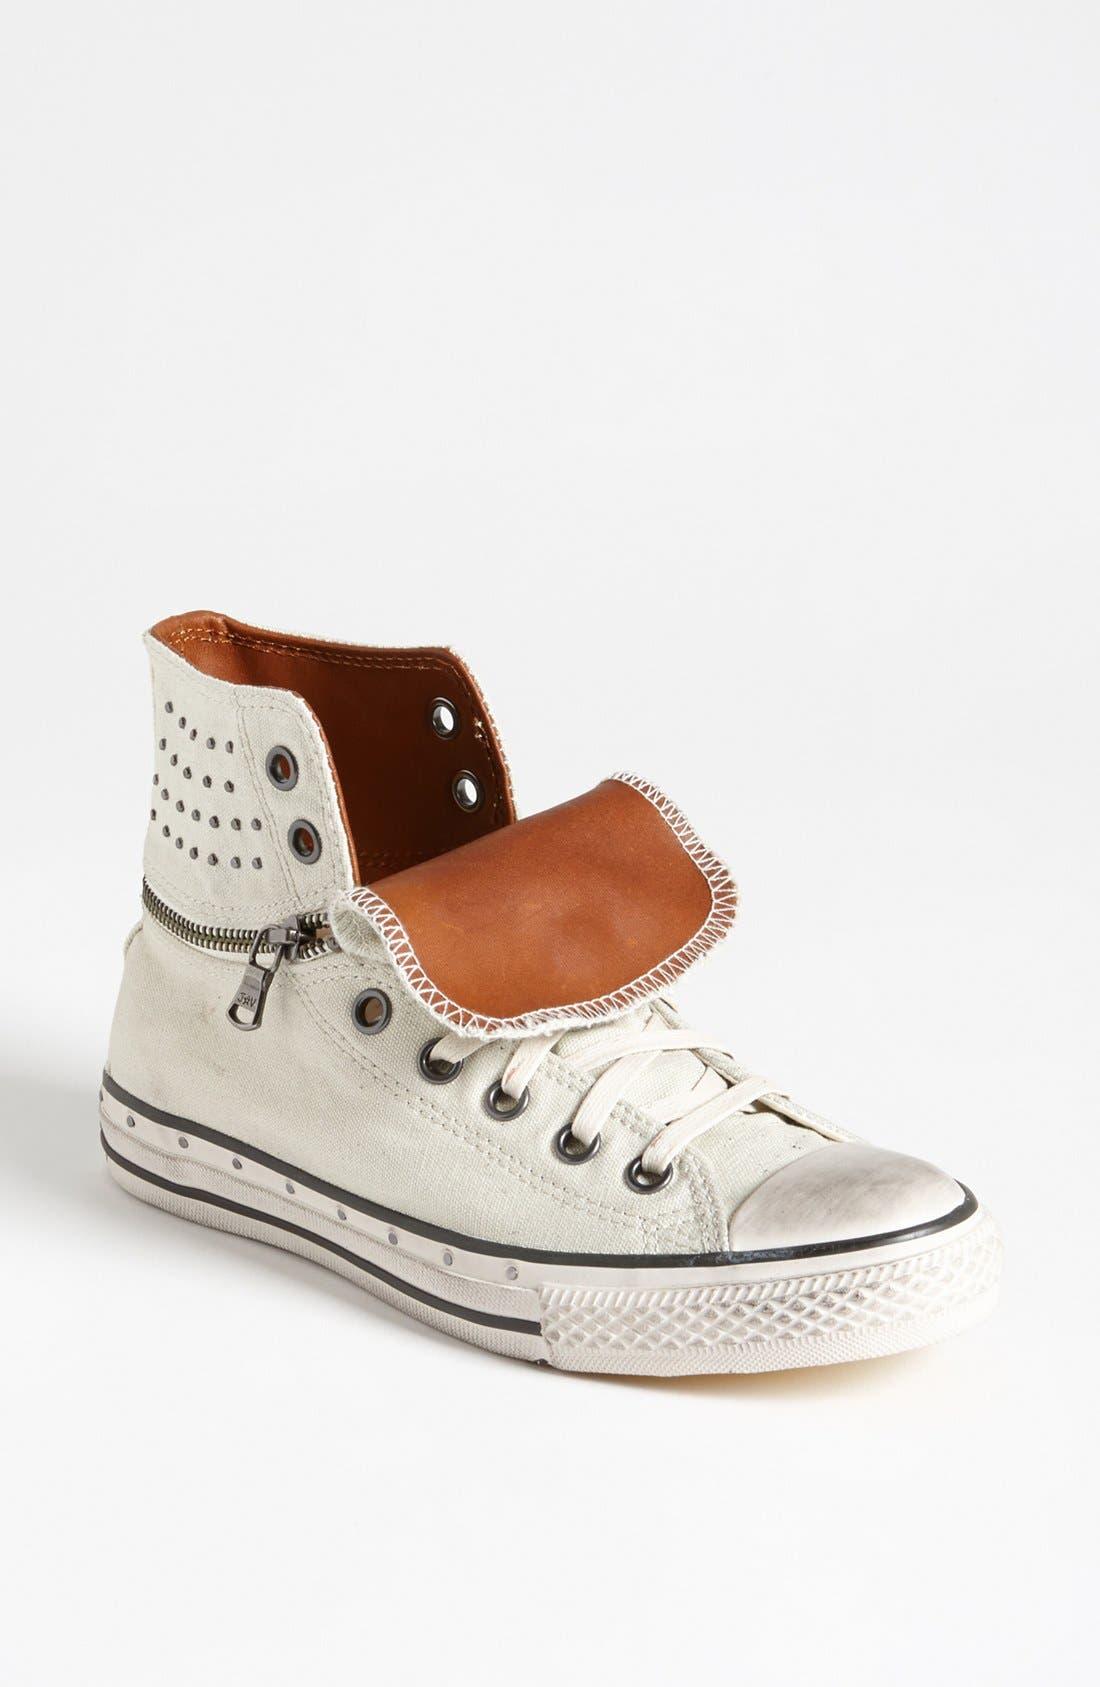 Alternate Image 1 Selected - Converse by John Varvatos Chuck Taylor® Convertible Sneaker (Women)